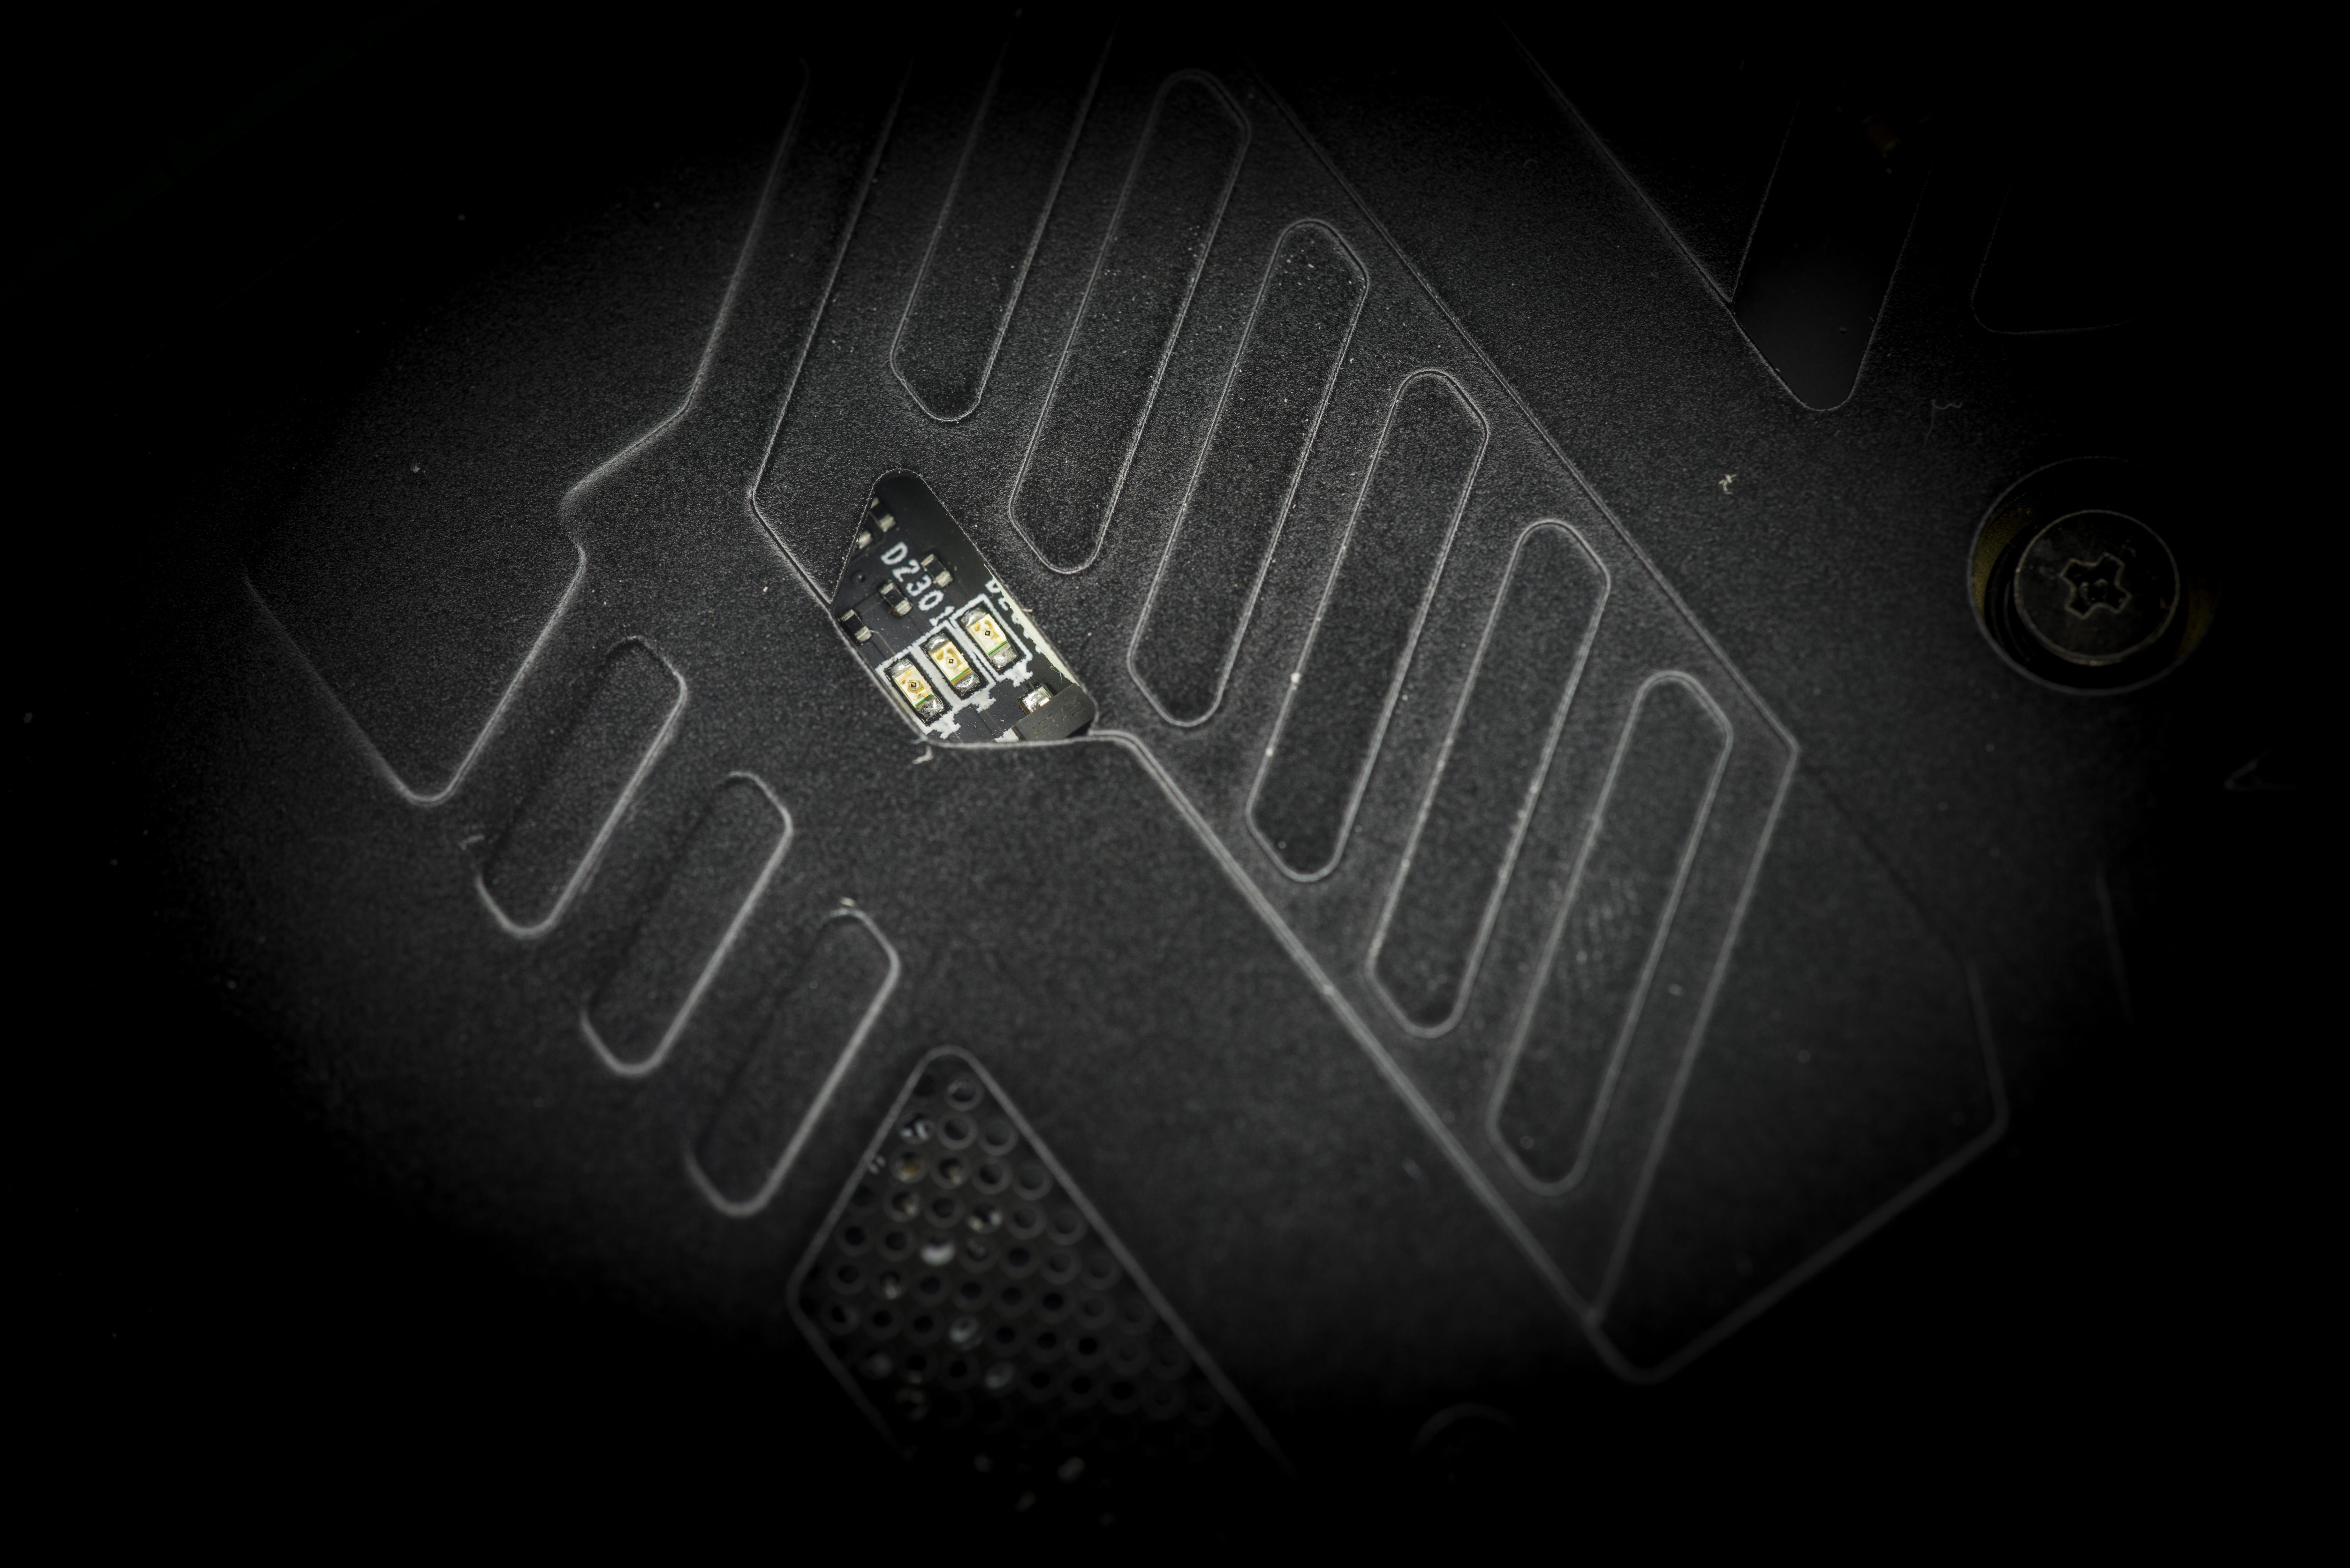 xDevs com | Extreme OC Guide for EVGA GeForce GTX 1080 Ti K|NGP|N